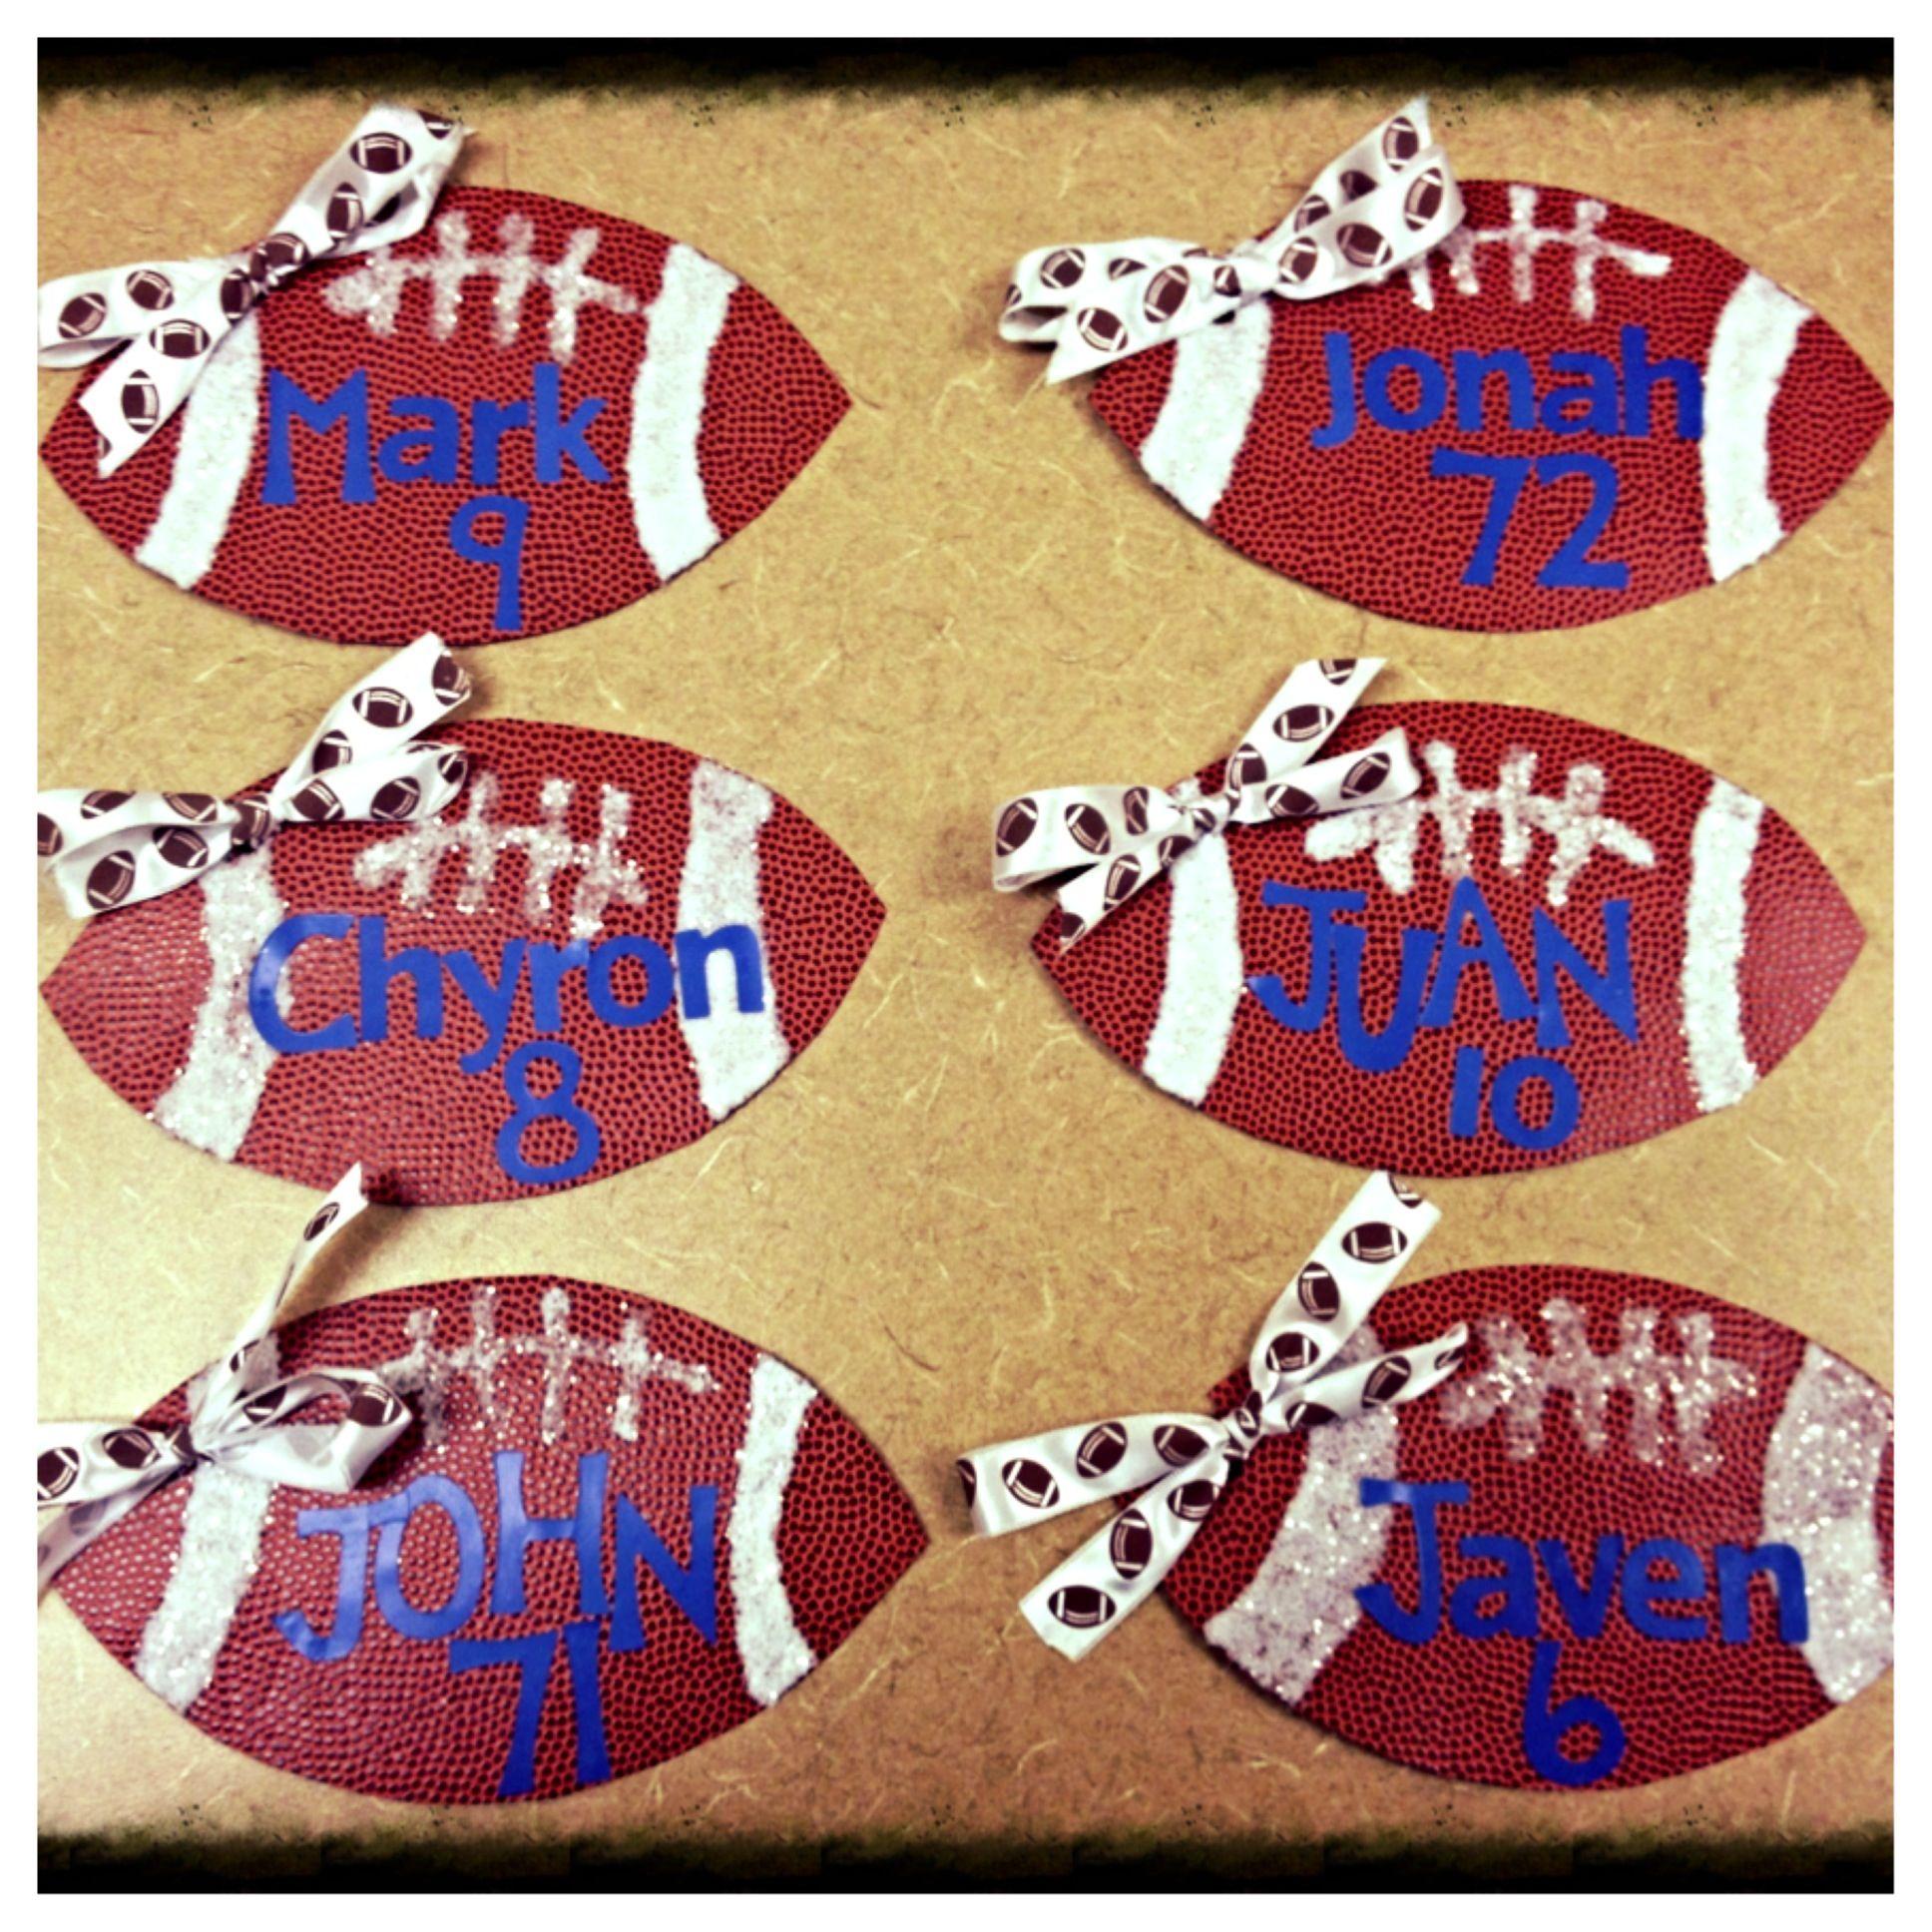 cheerleading locker decorations. Locker decorations  football players from cheerleaders Kids